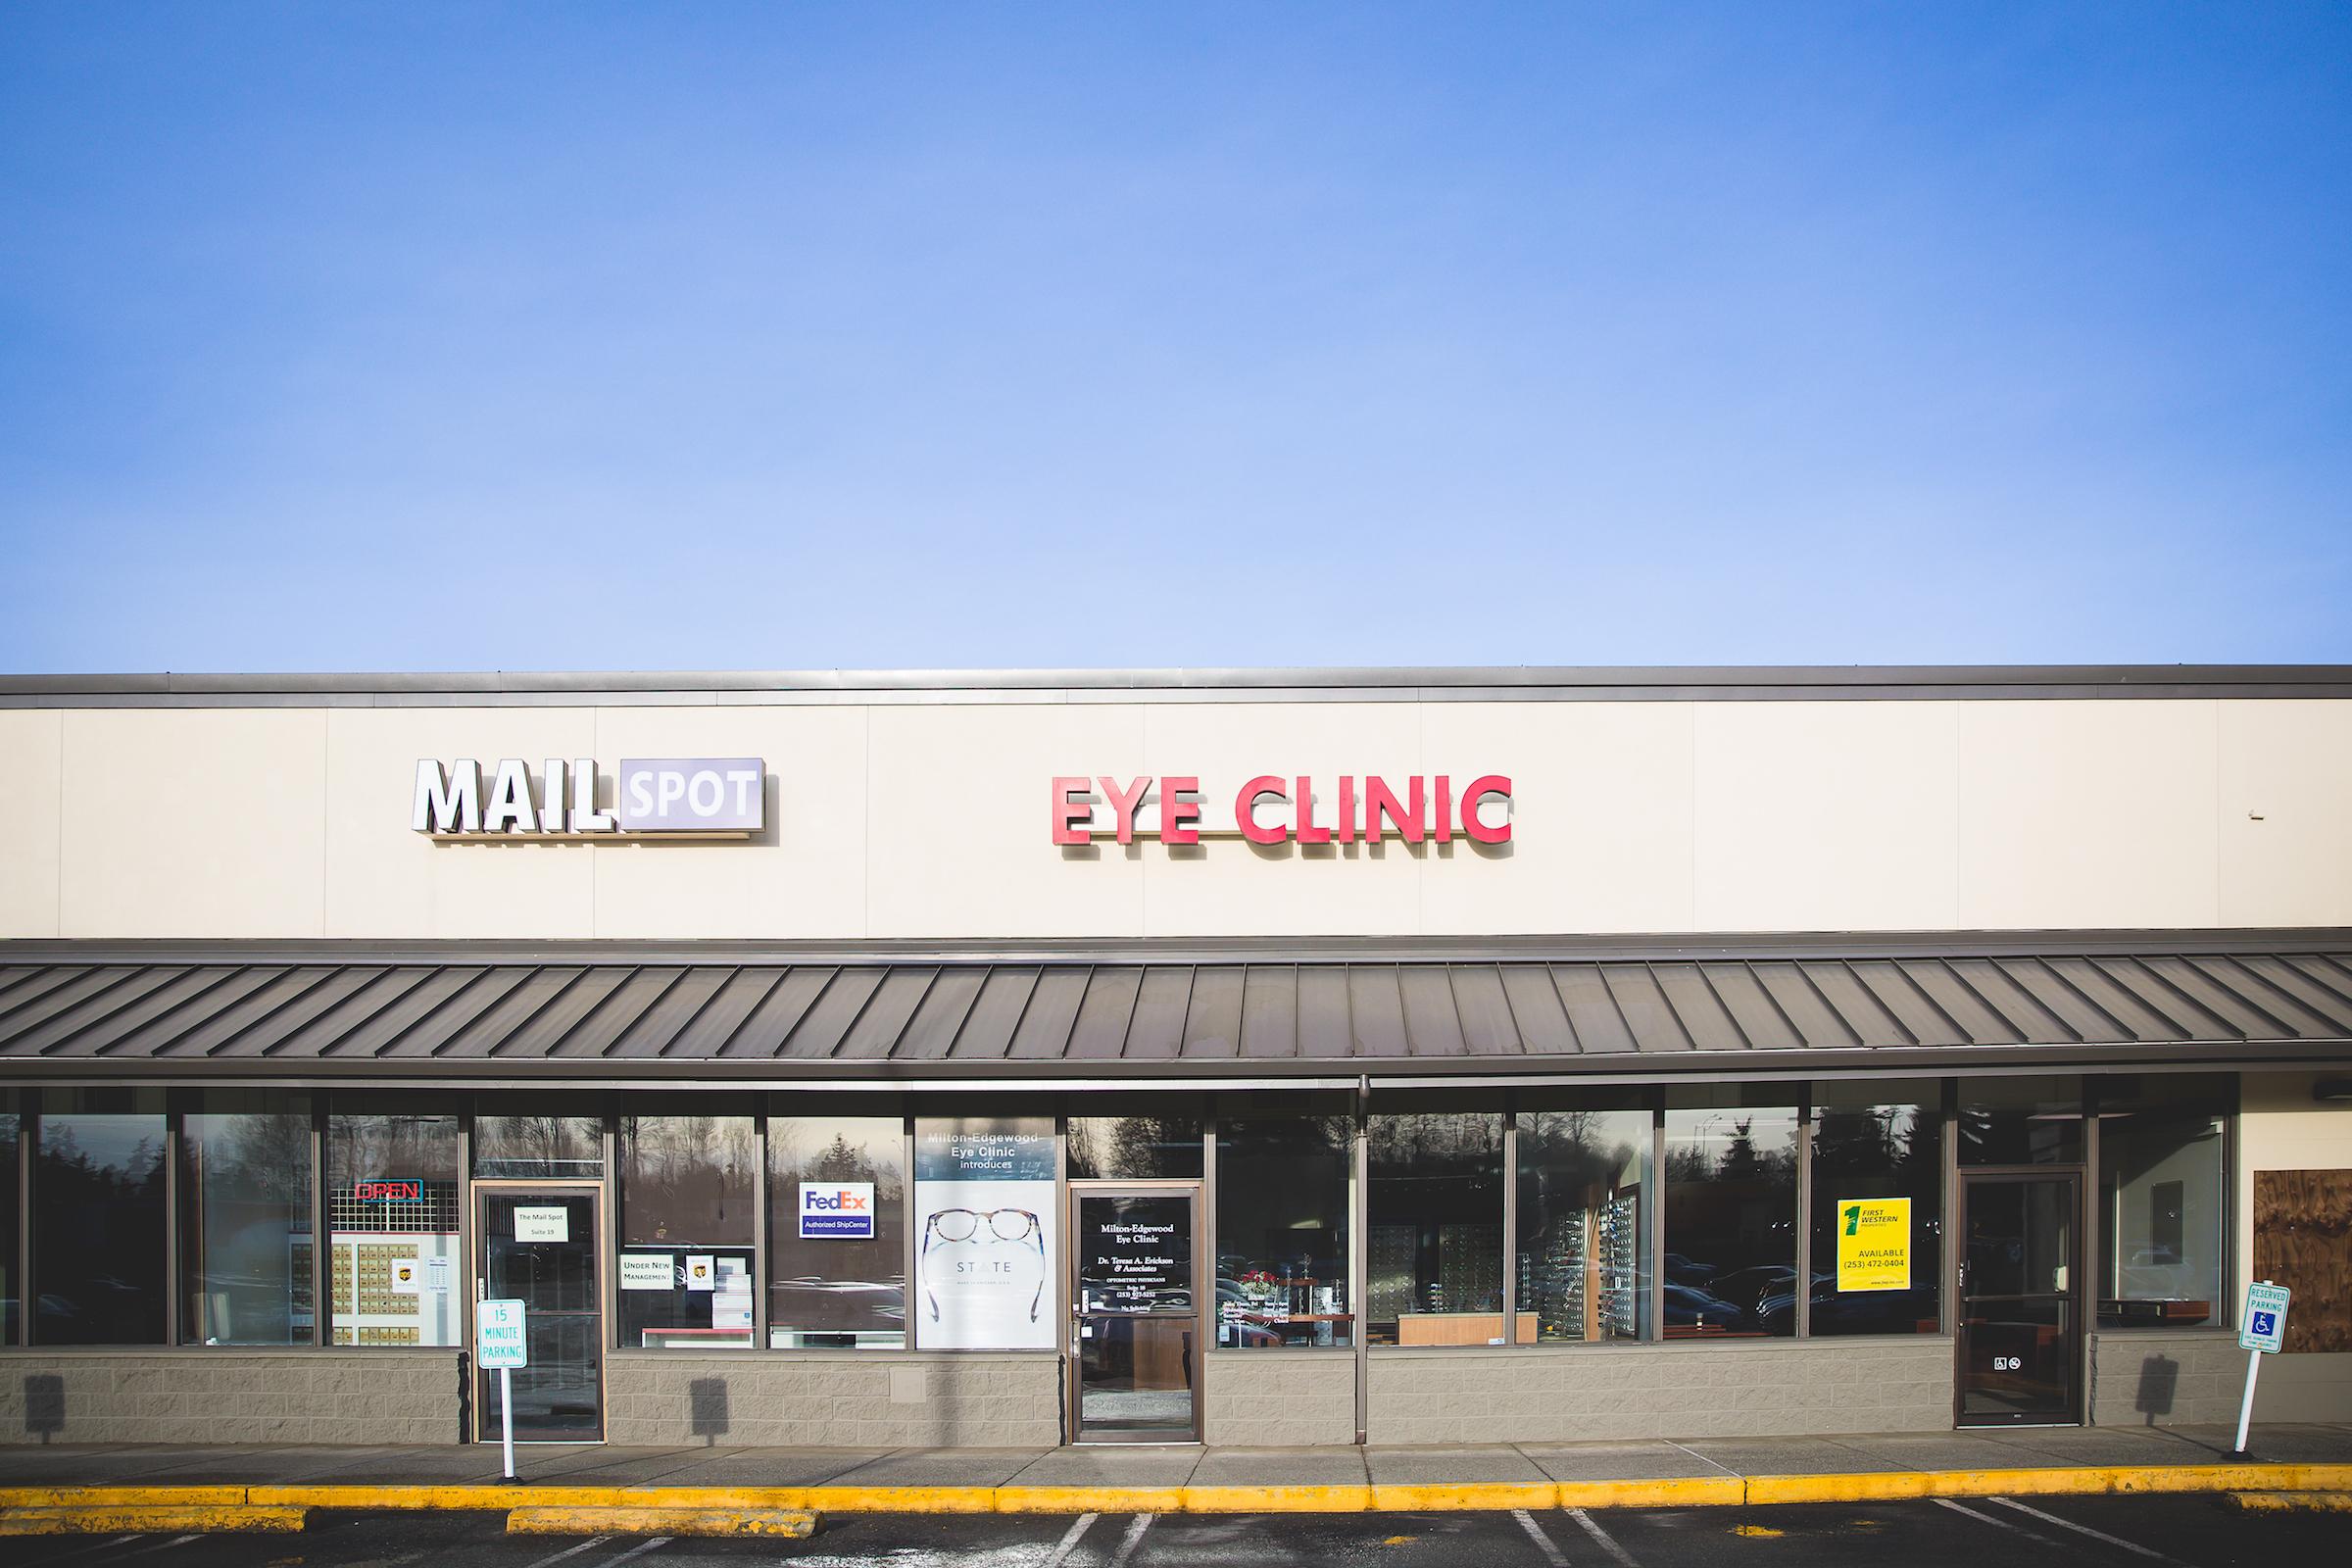 Milton-Edgewood Eye Clinic